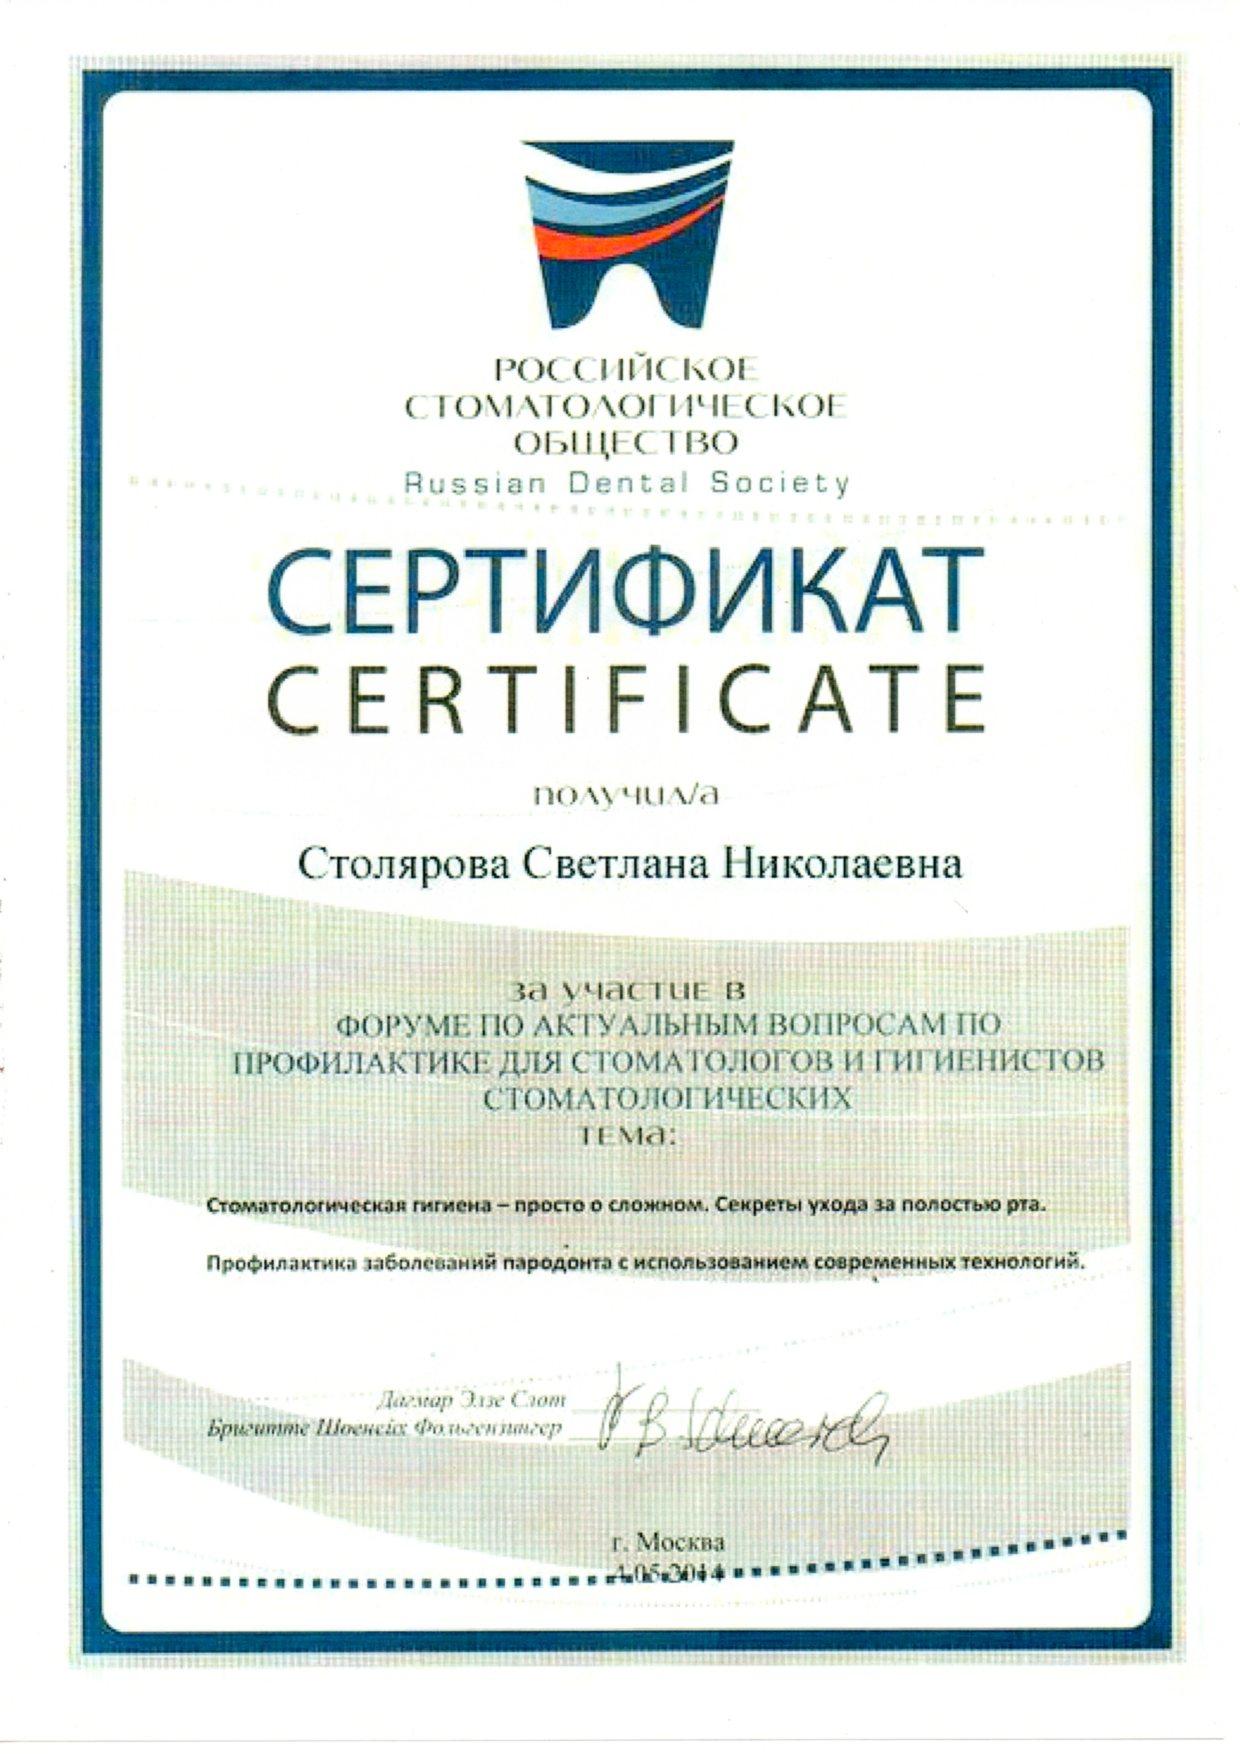 Столярова Светлана Николаевна - Сертификат_02